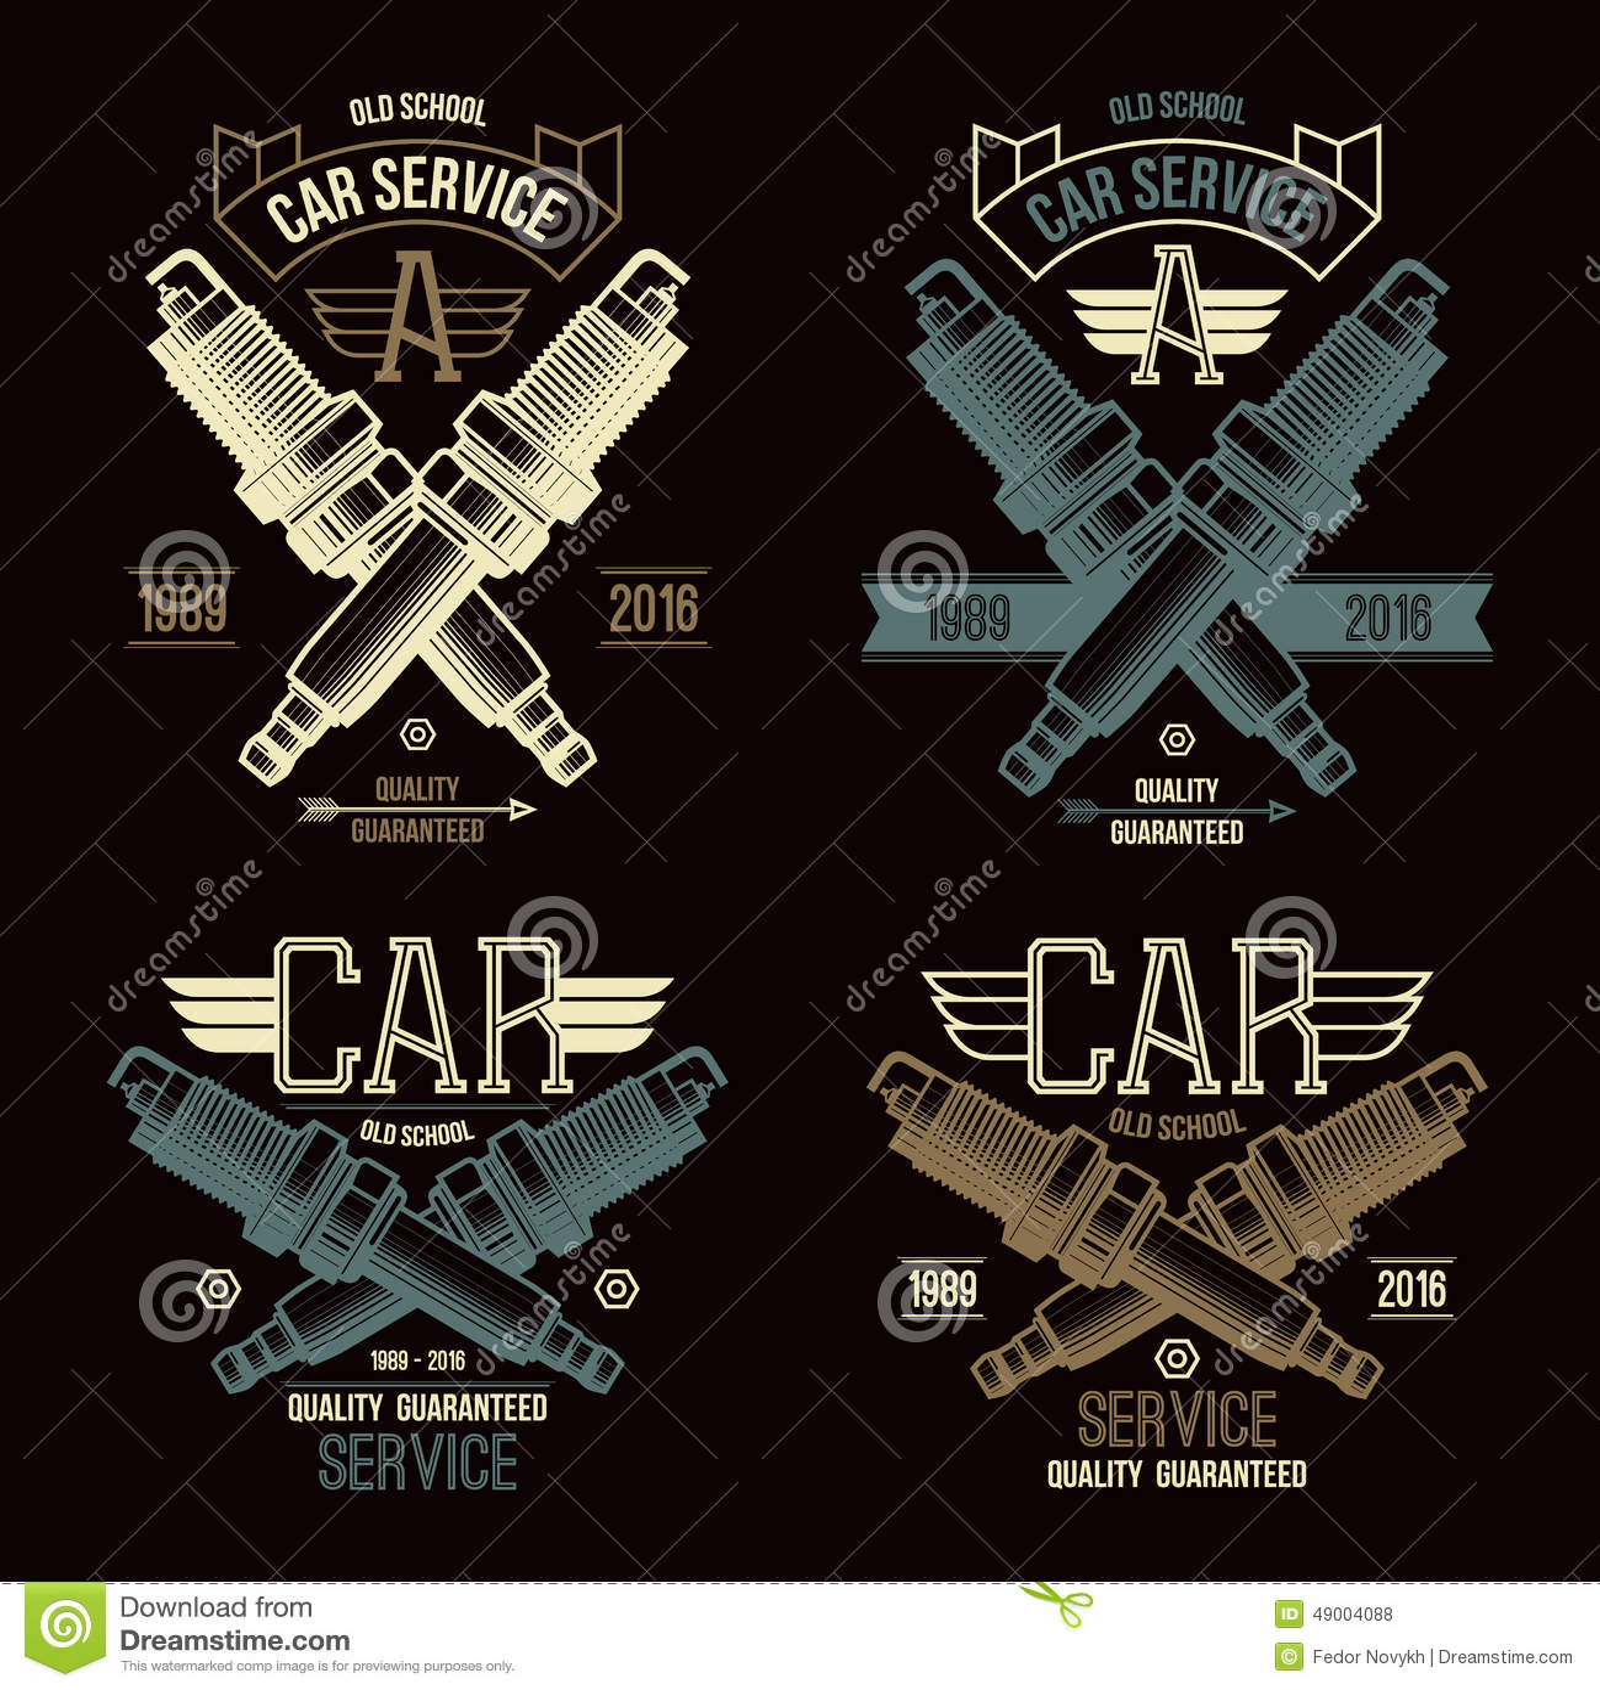 Design car emblem - Car Service Spark Plug Emblems Royalty Free Stock Photos